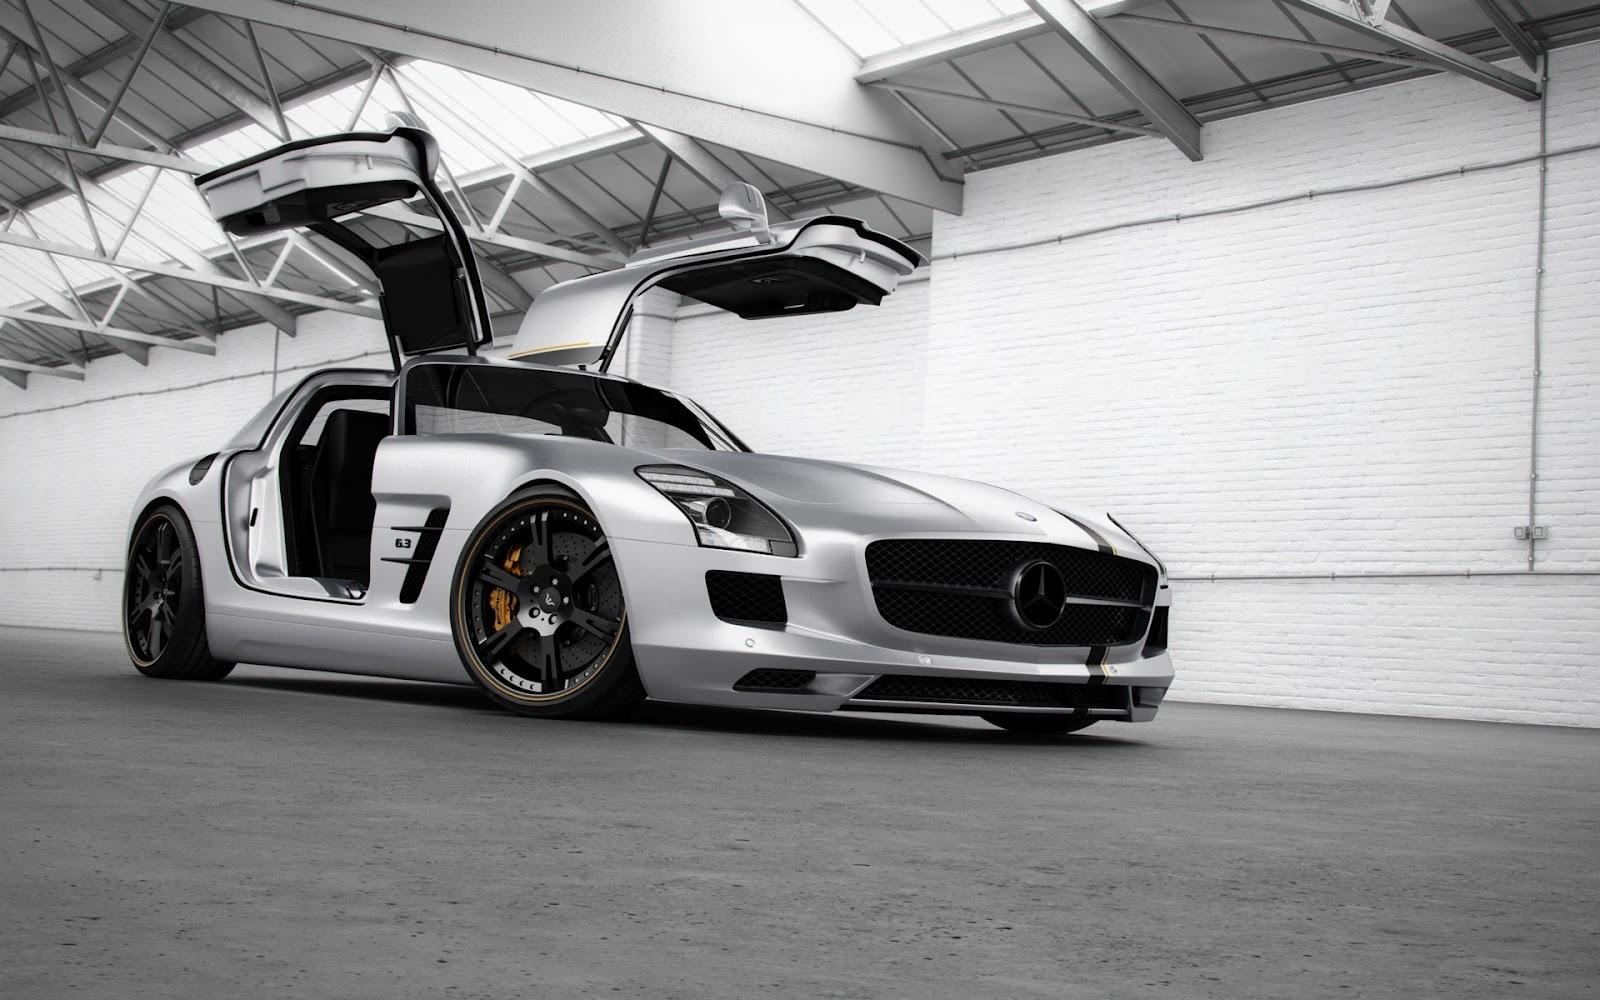 http://3.bp.blogspot.com/-WFlVUKC1Xho/T51zIC1qq0I/AAAAAAAAbJQ/P2Tt8C39gOQ/s1600/Mercedes-Benz-AMG-SLS_04.jpg